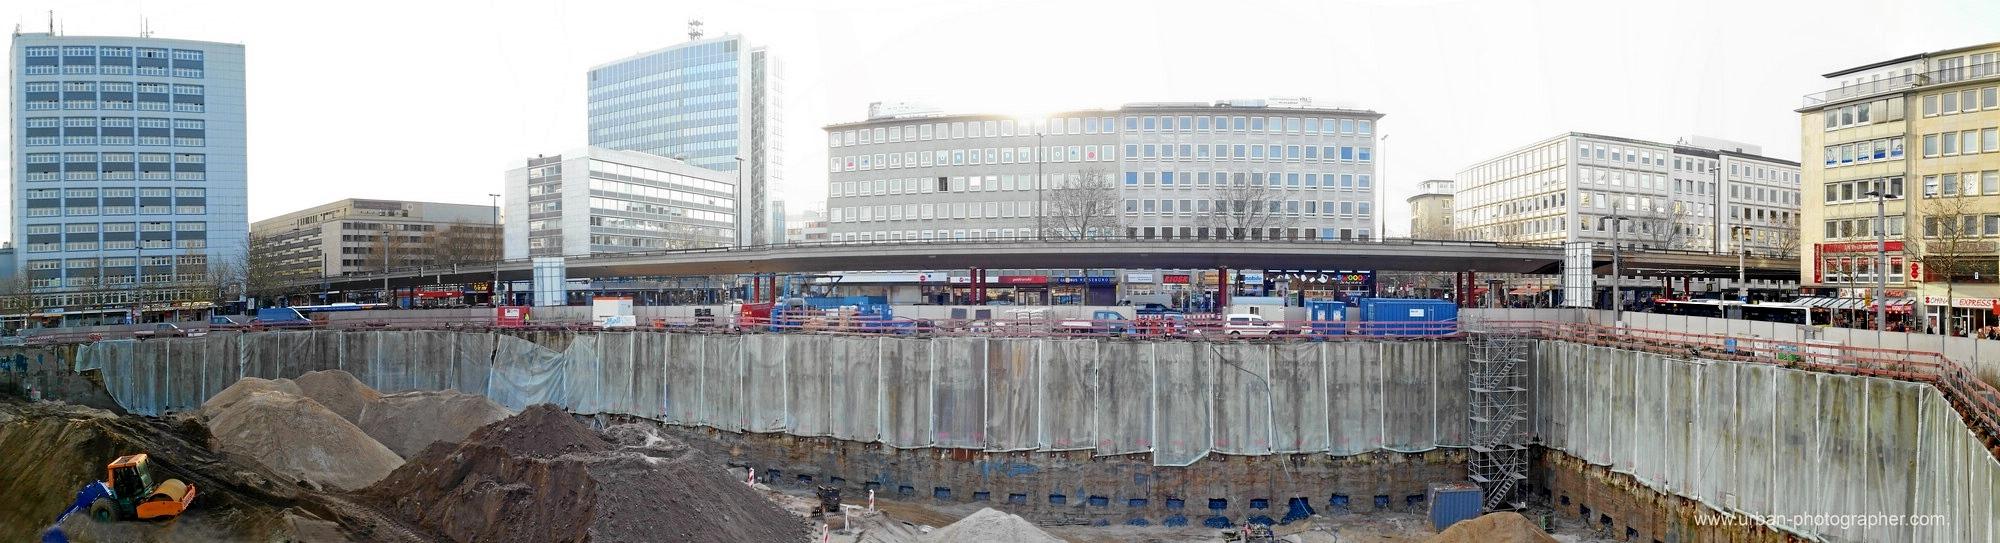 Baustelle Bahnhofsplatz 82